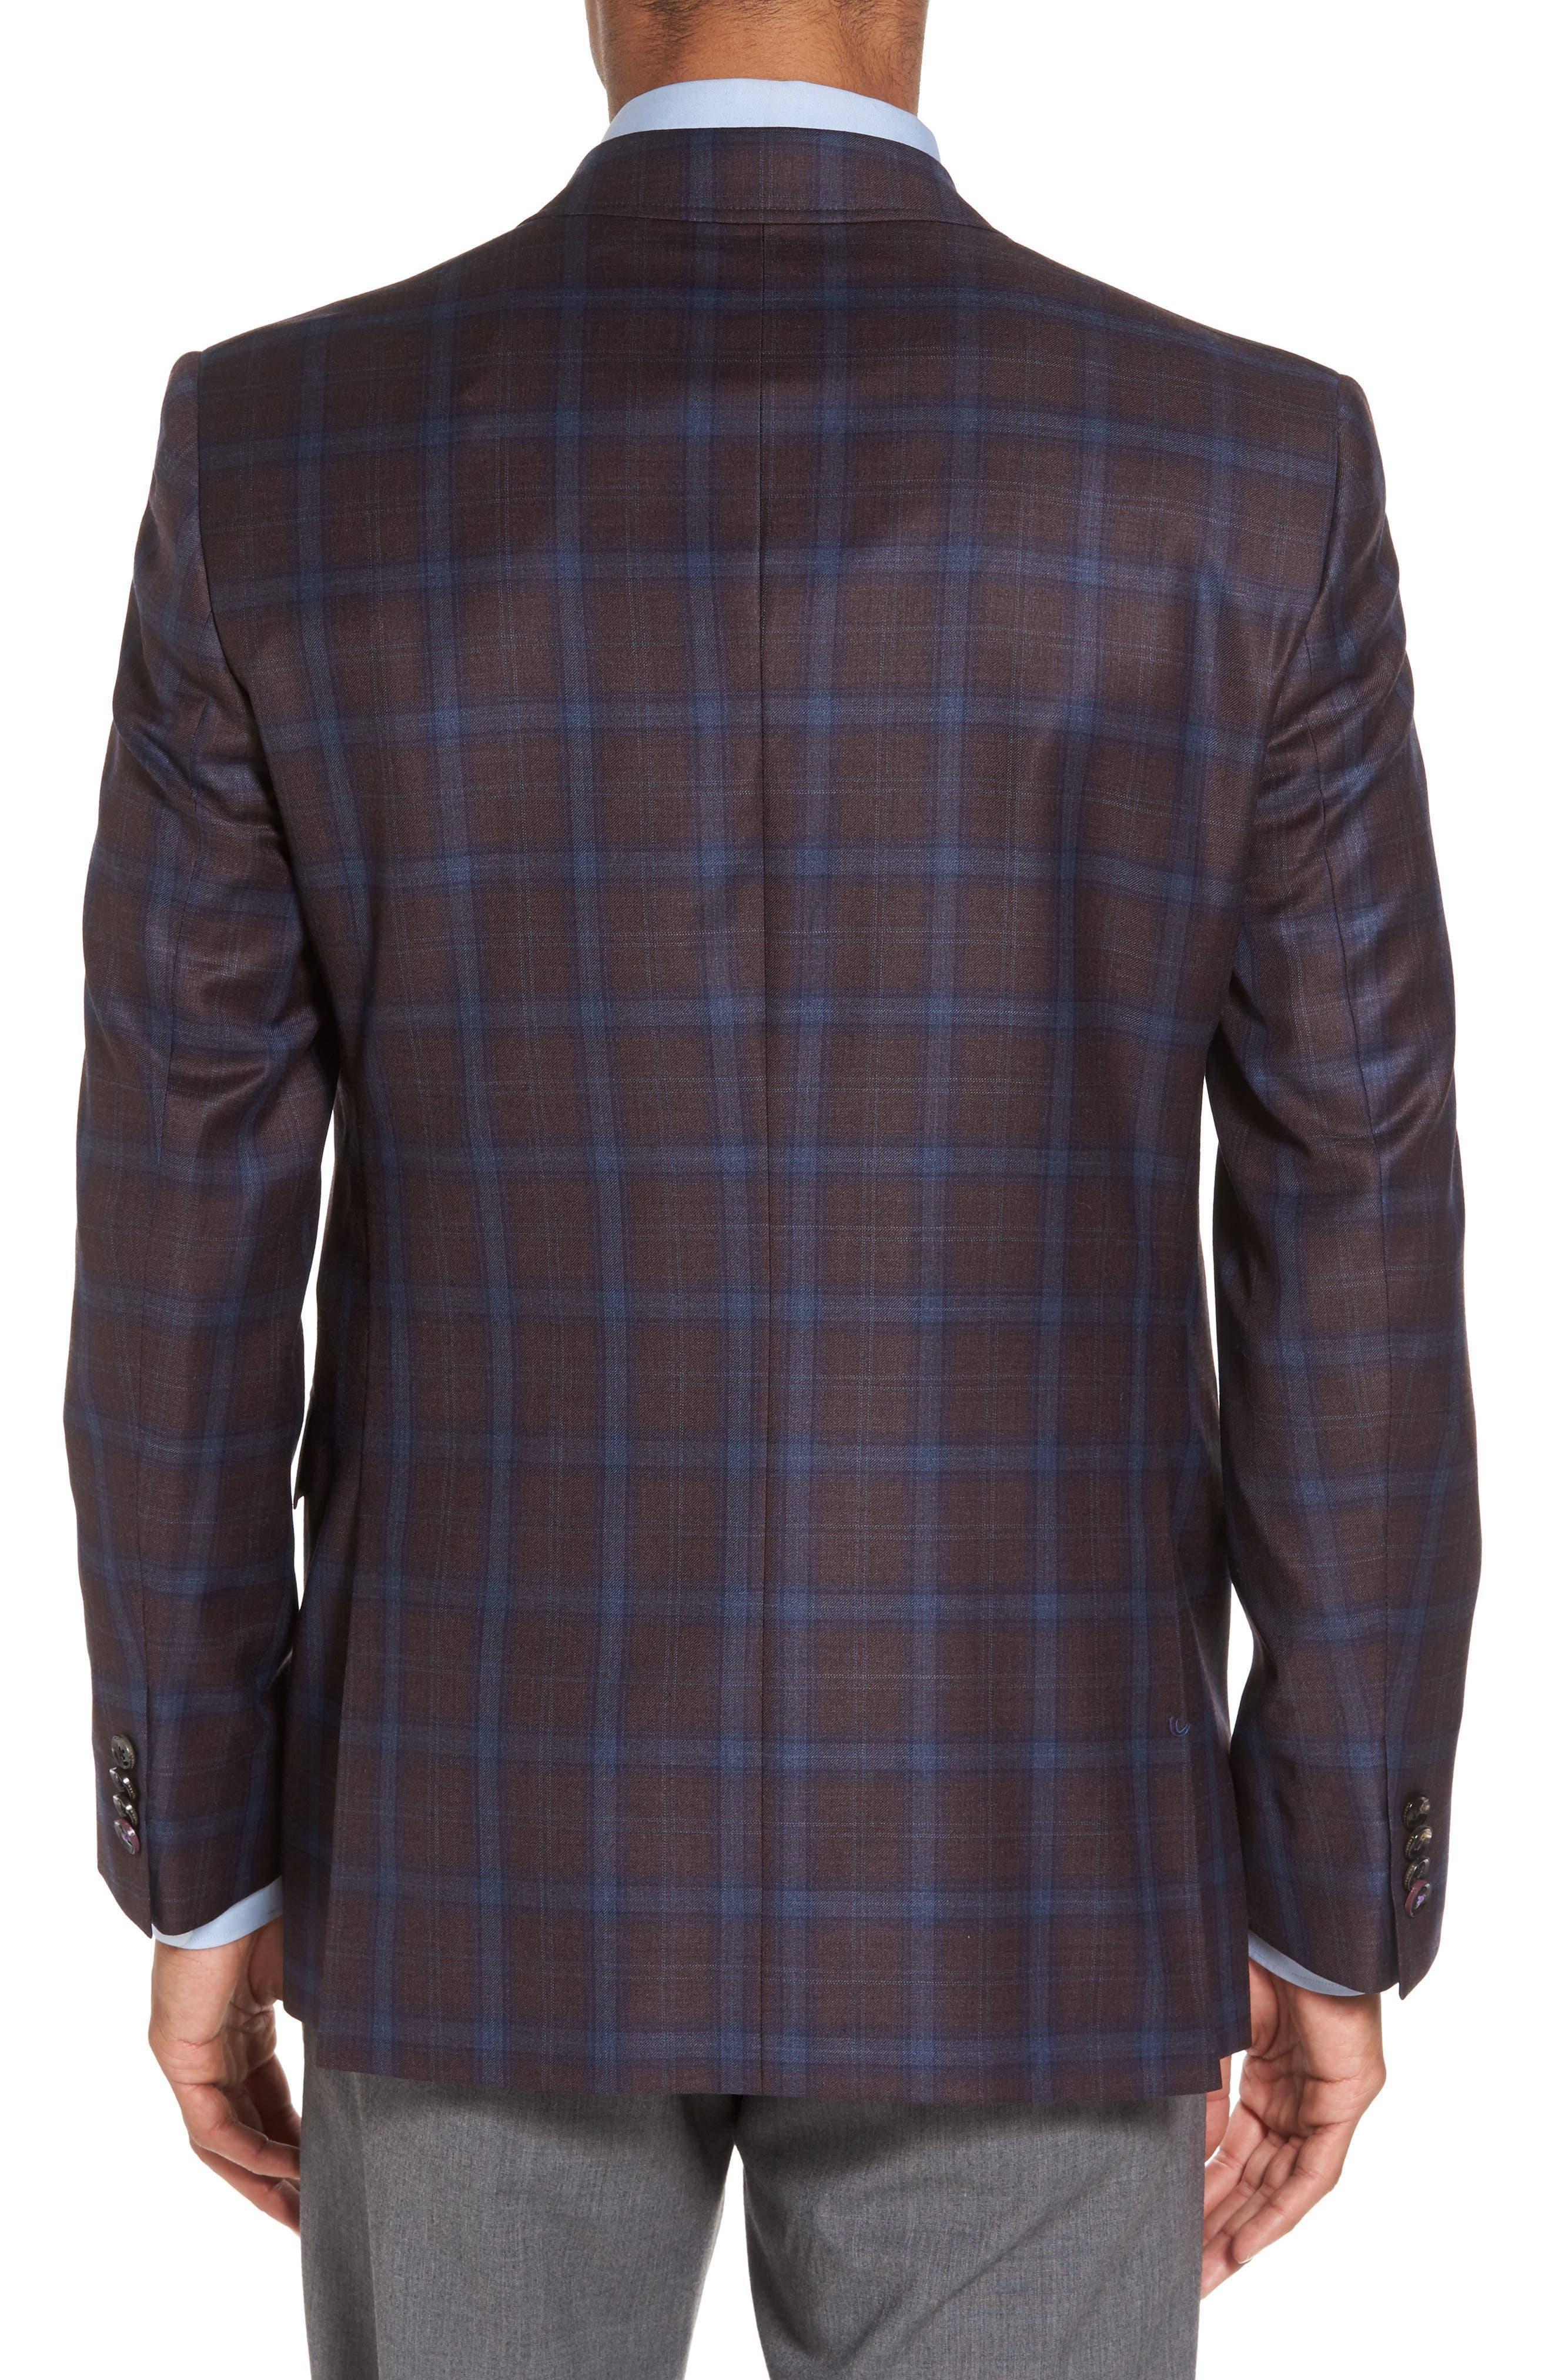 Jay Trim Fit Plaid Wool Sport Coat,                             Alternate thumbnail 2, color,                             932